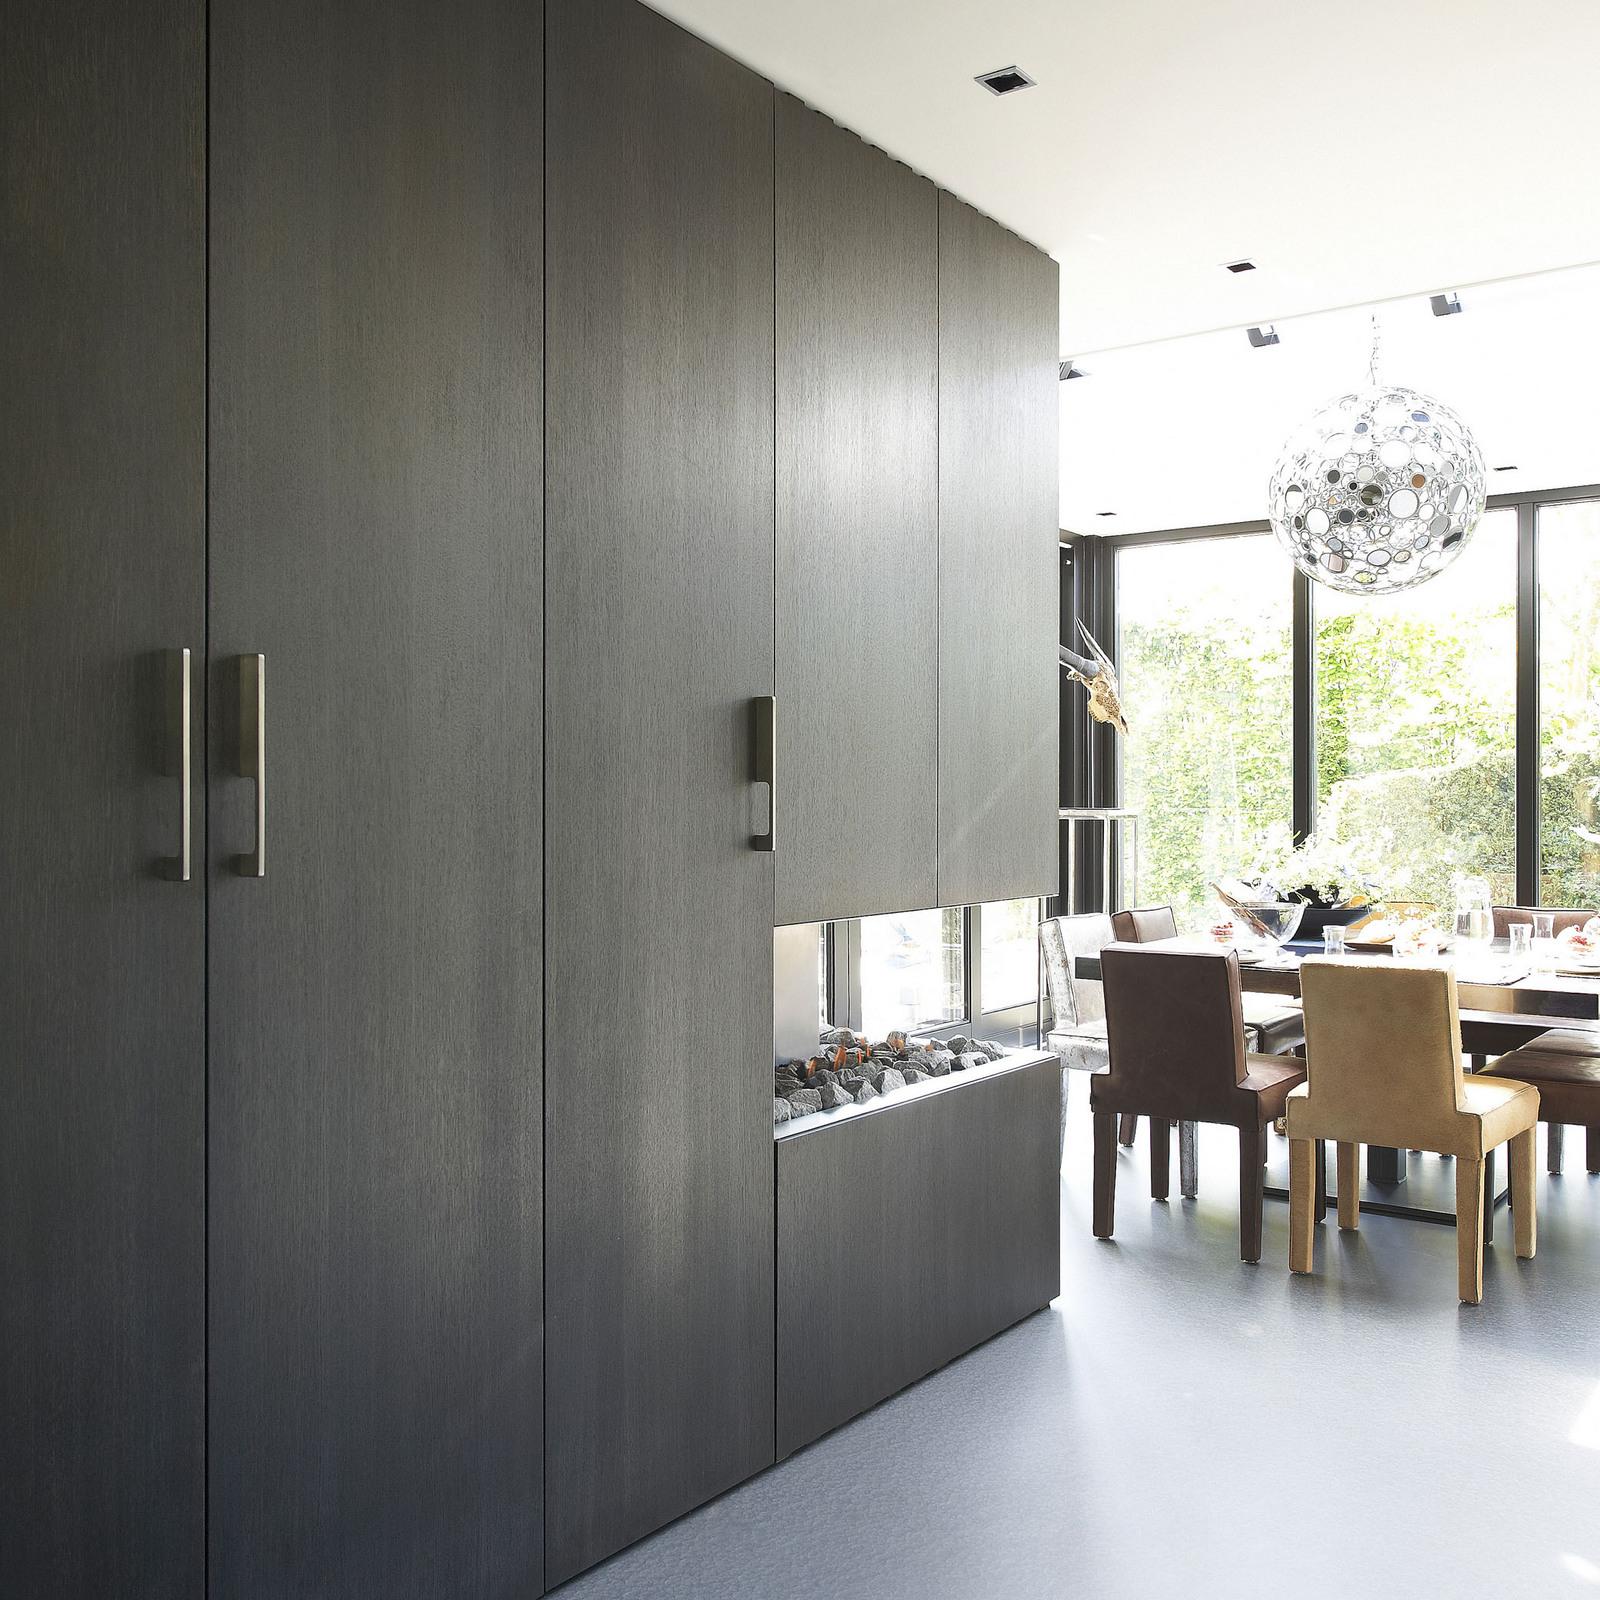 Woonkeuken met haard en moderne design keukenkasten van Culimaatvan